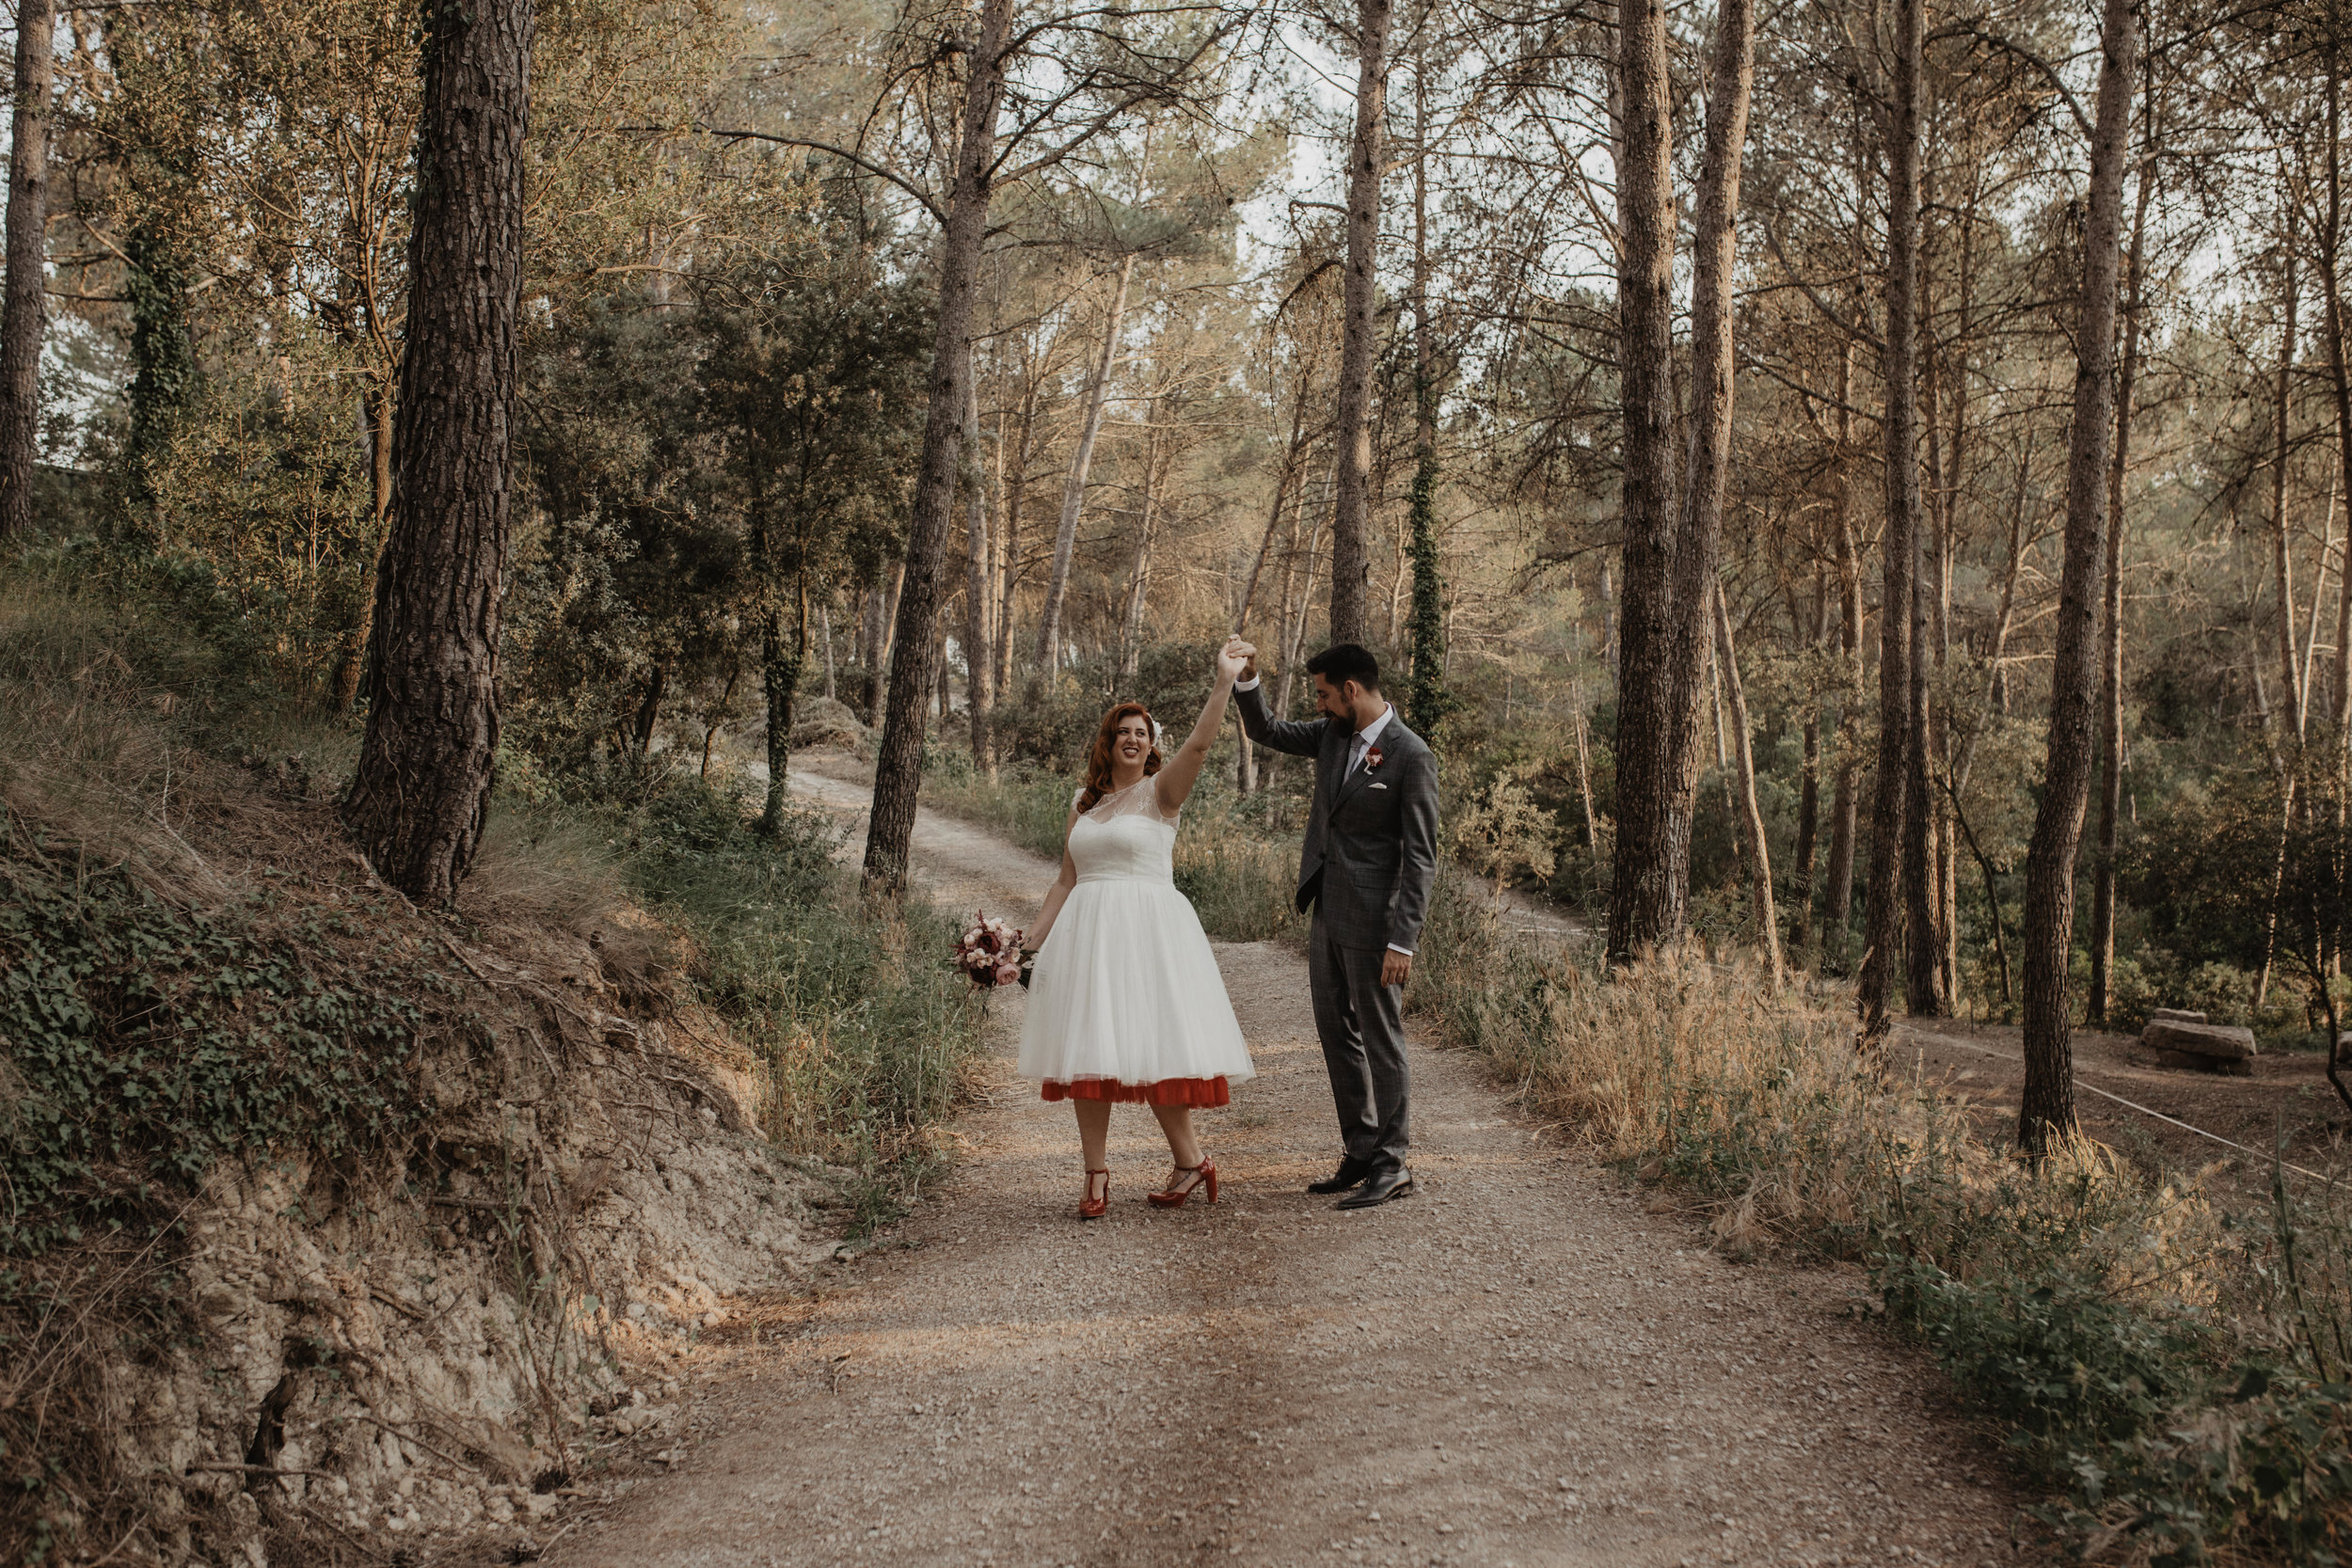 thenortherngirlphotography_photography_thenortherngirl_rebeccascabros_wedding_weddingphotography_masialagarrigadecastelladral_joaniemma_bodaenbarcelona_weddingphotographer_emmaijoan-460.jpg